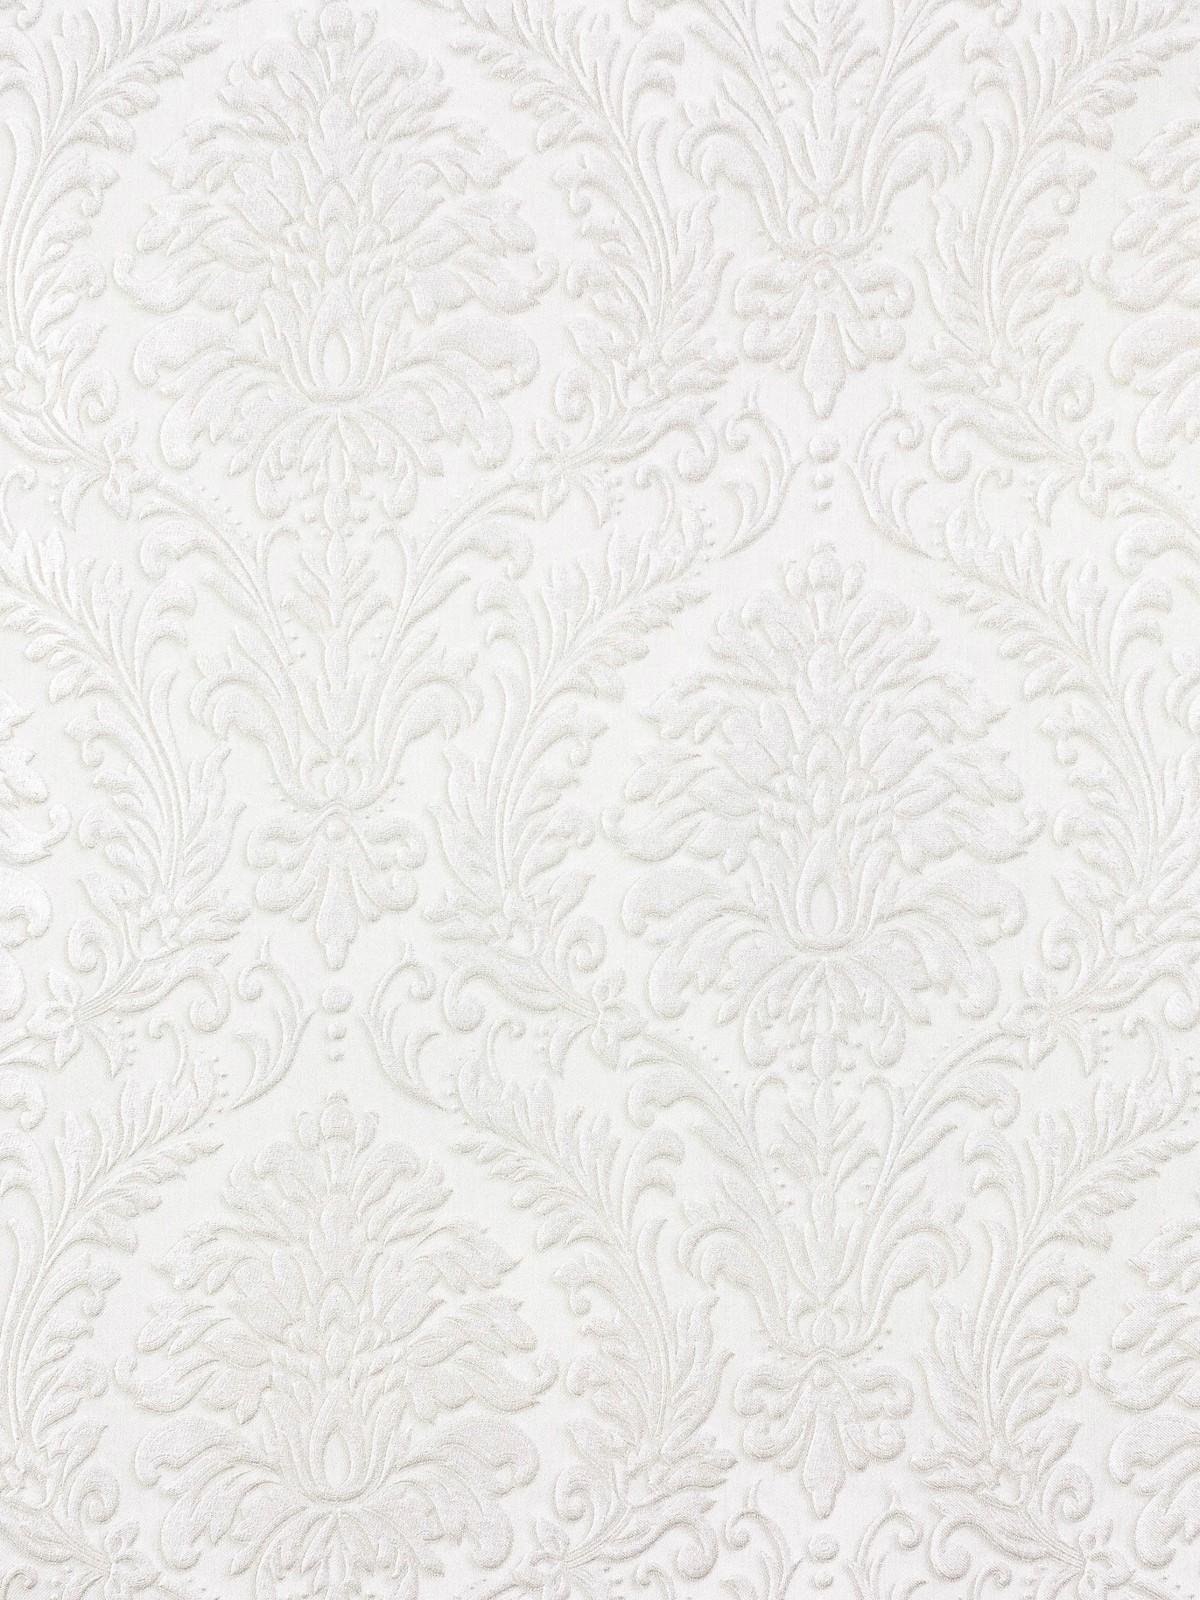 tapeten rasch vliestapeten trianon 2015 barock wei 512816 ebay. Black Bedroom Furniture Sets. Home Design Ideas